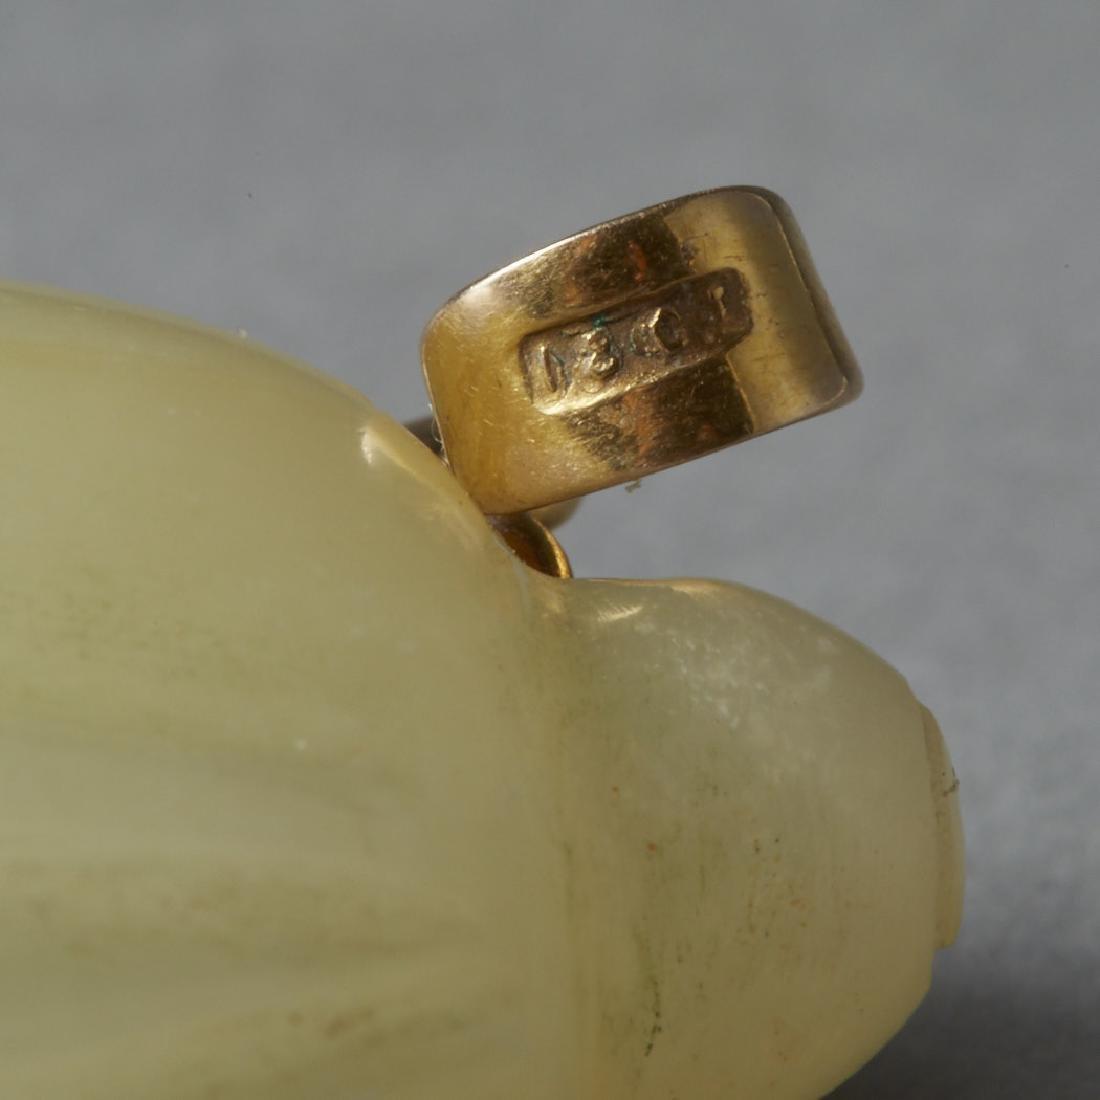 Chinese Guangxu Hardstone e Cicada 18ct Gold - BTC Acpt - 4